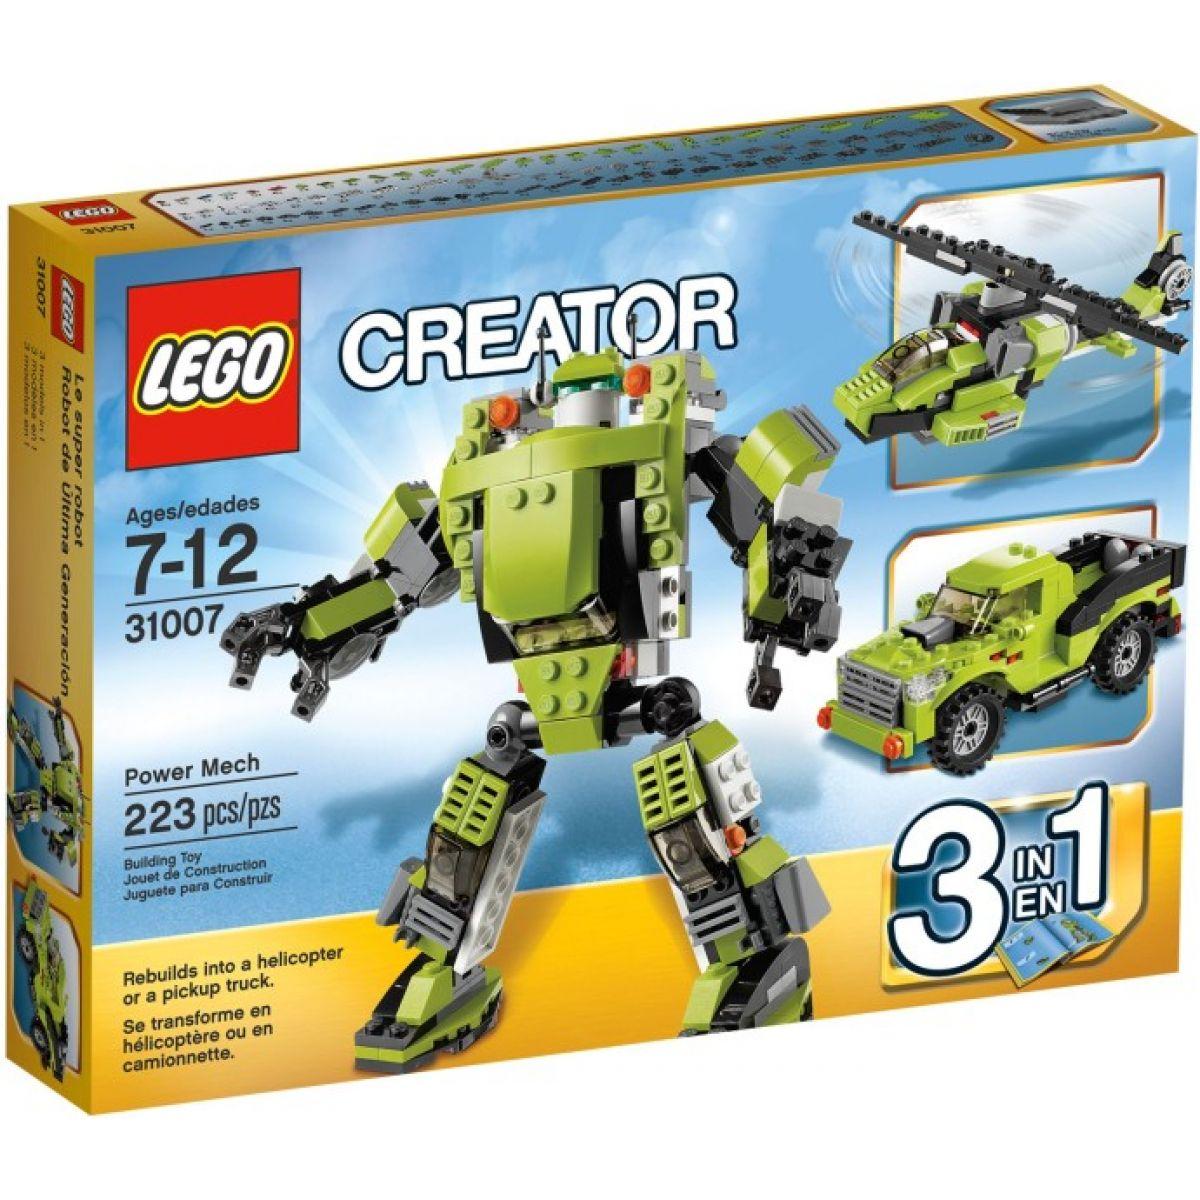 LEGO CREATOR 31007 Robot